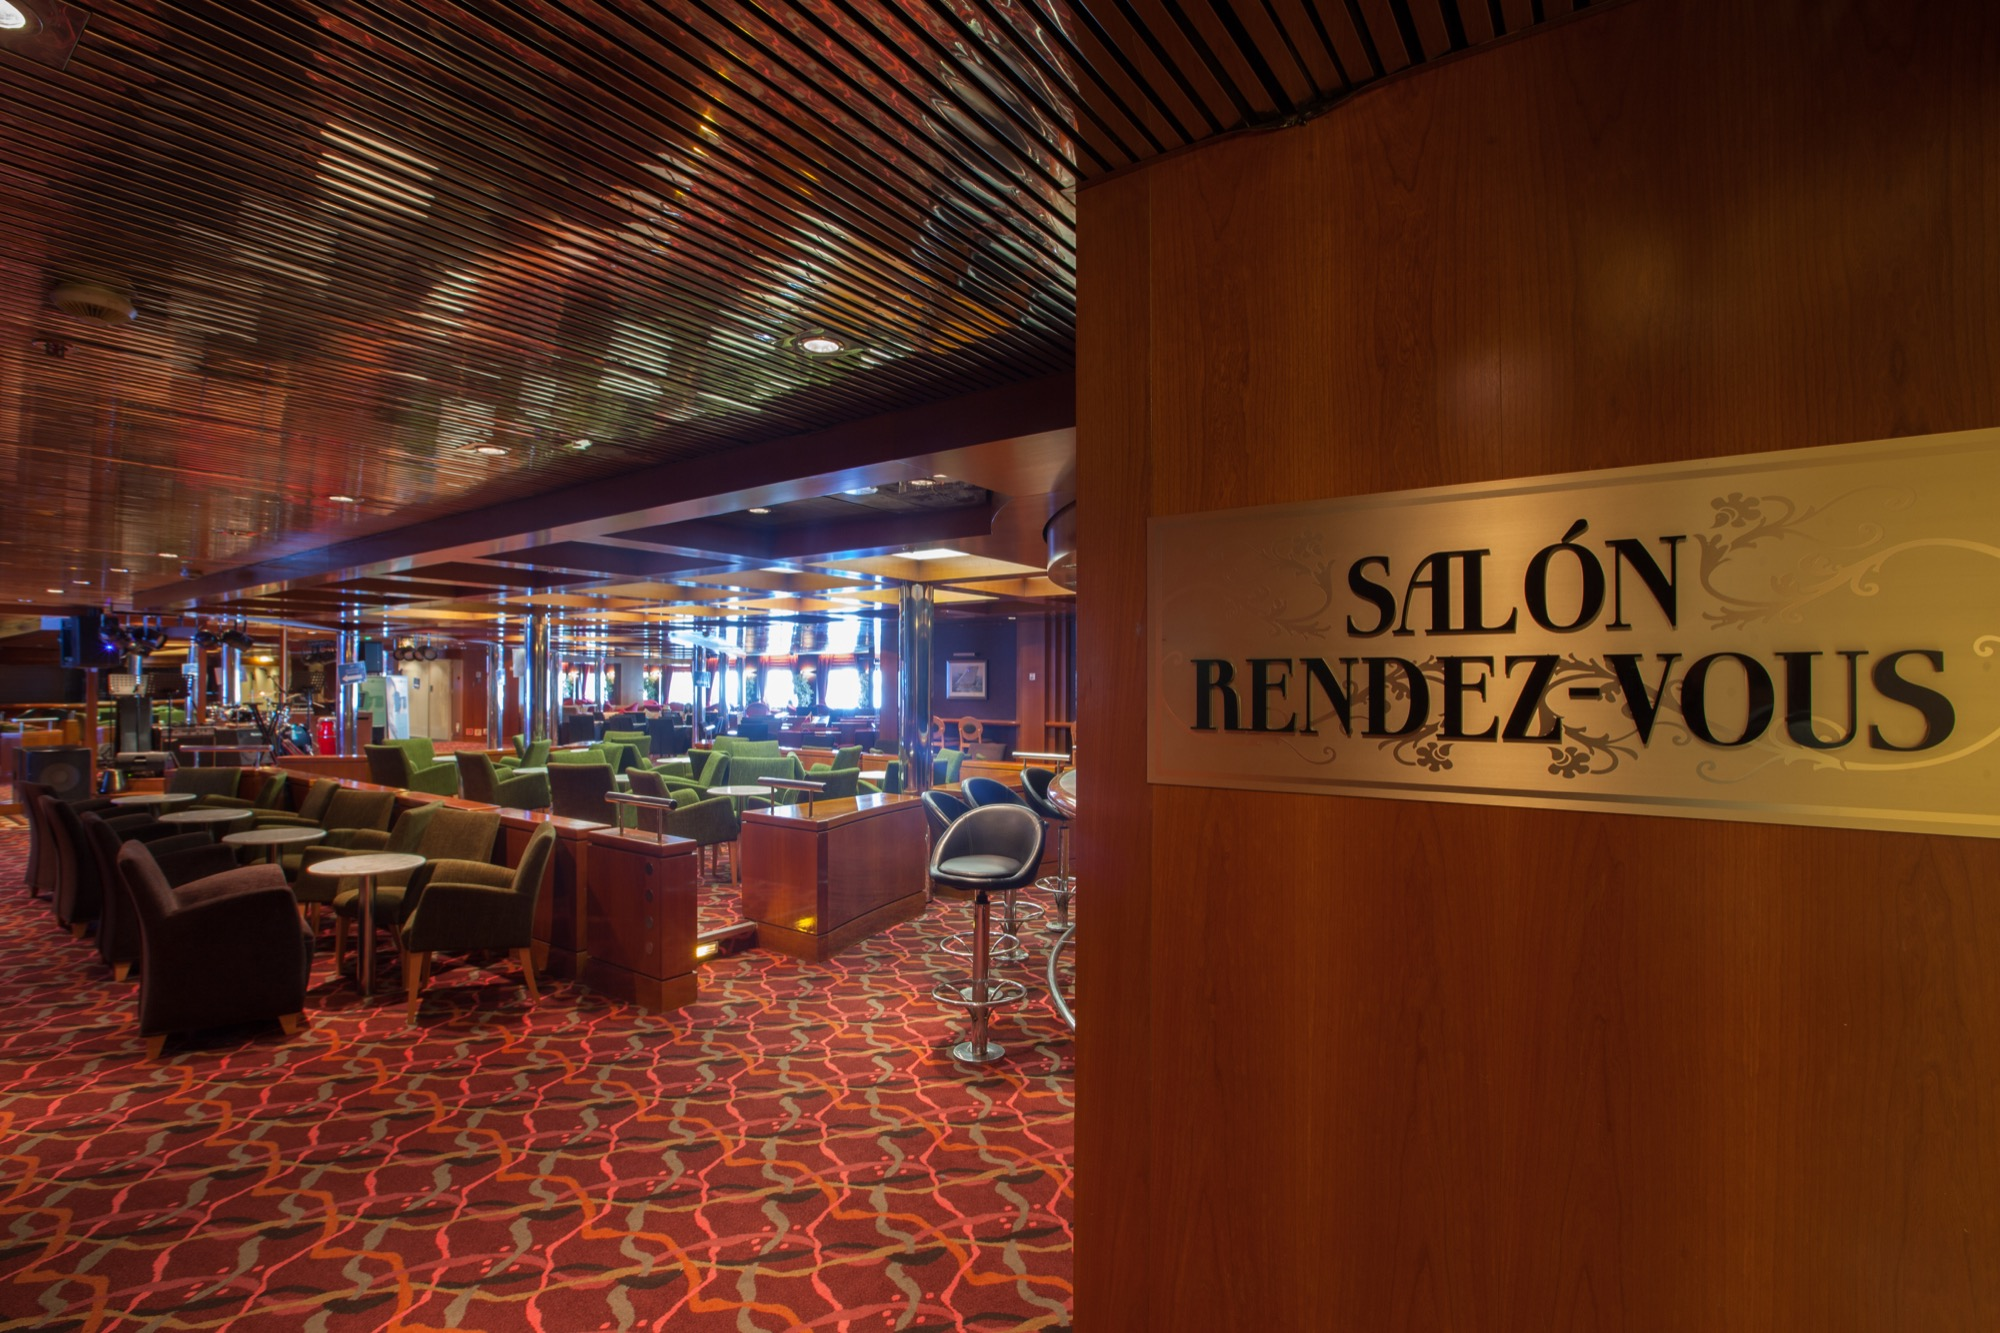 Pullmantur Zenith Interior Rendez-Vous Lounge 1.jpg